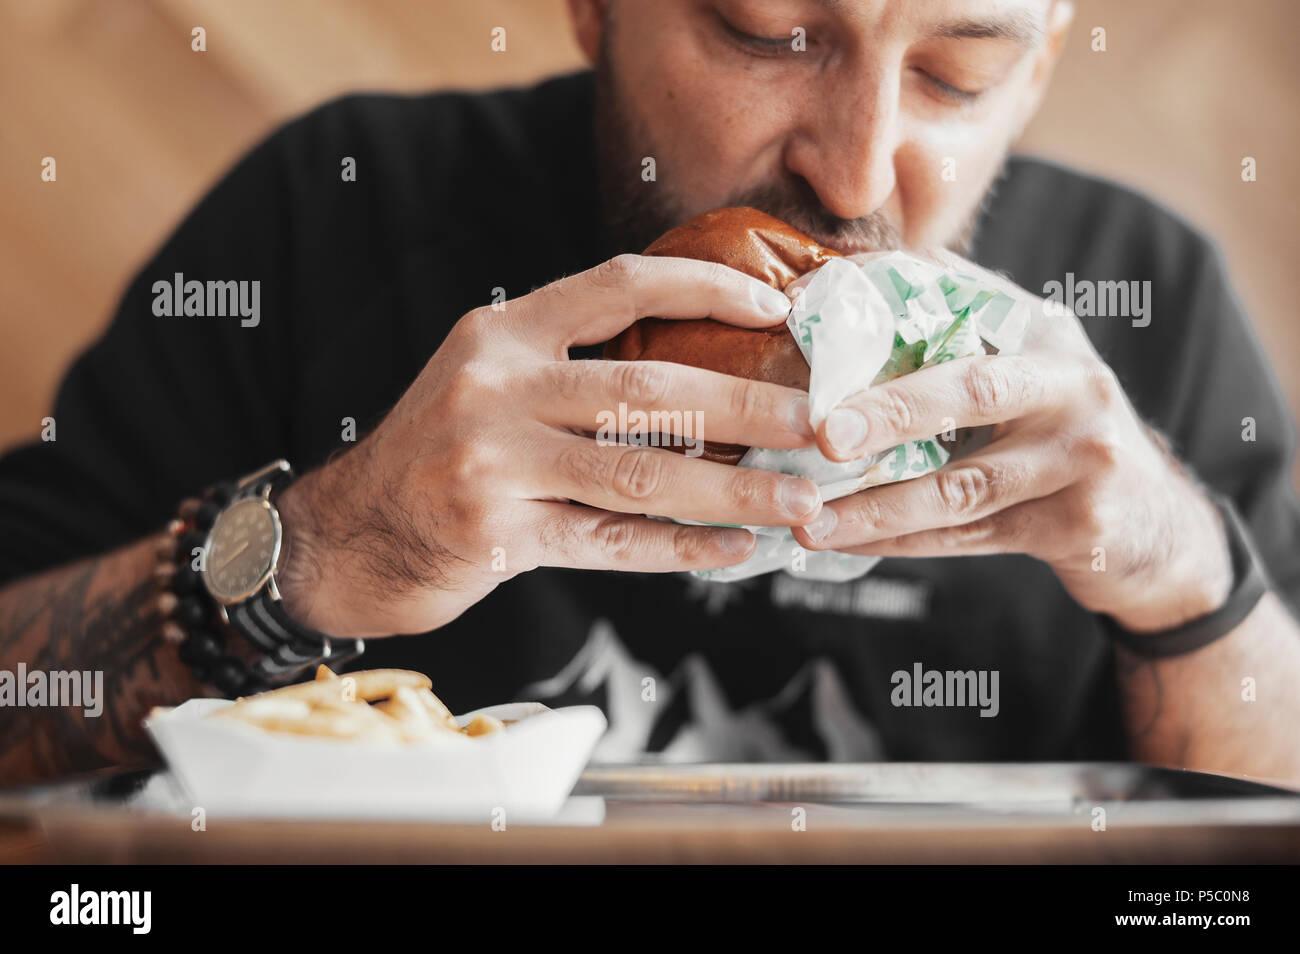 Joven barbudo hombre comiendo hamburguesas. Imagen De Stock